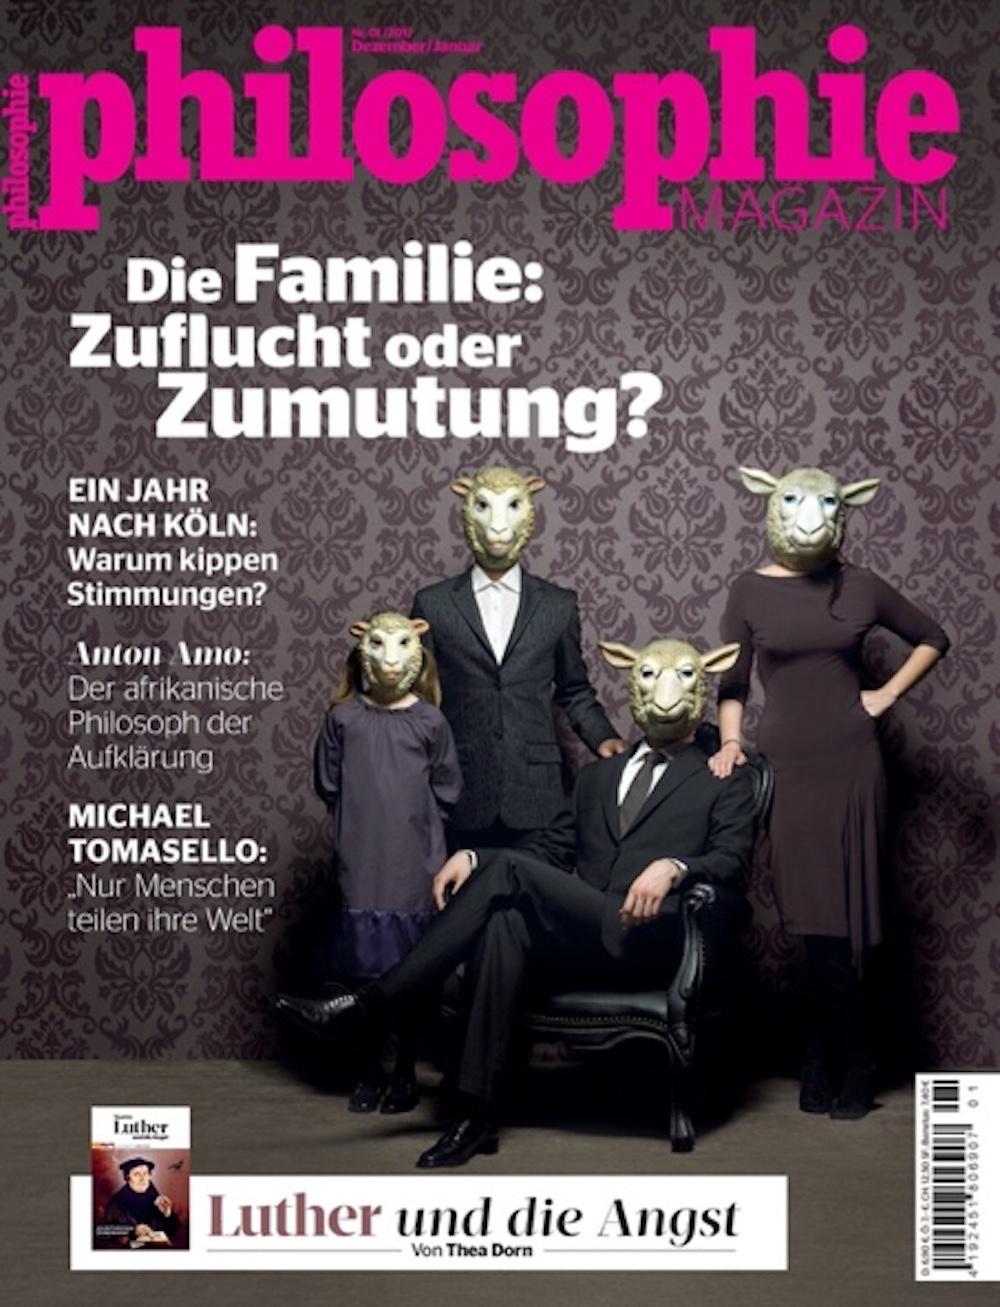 Philosophie Magazin 2016-2017-12-01